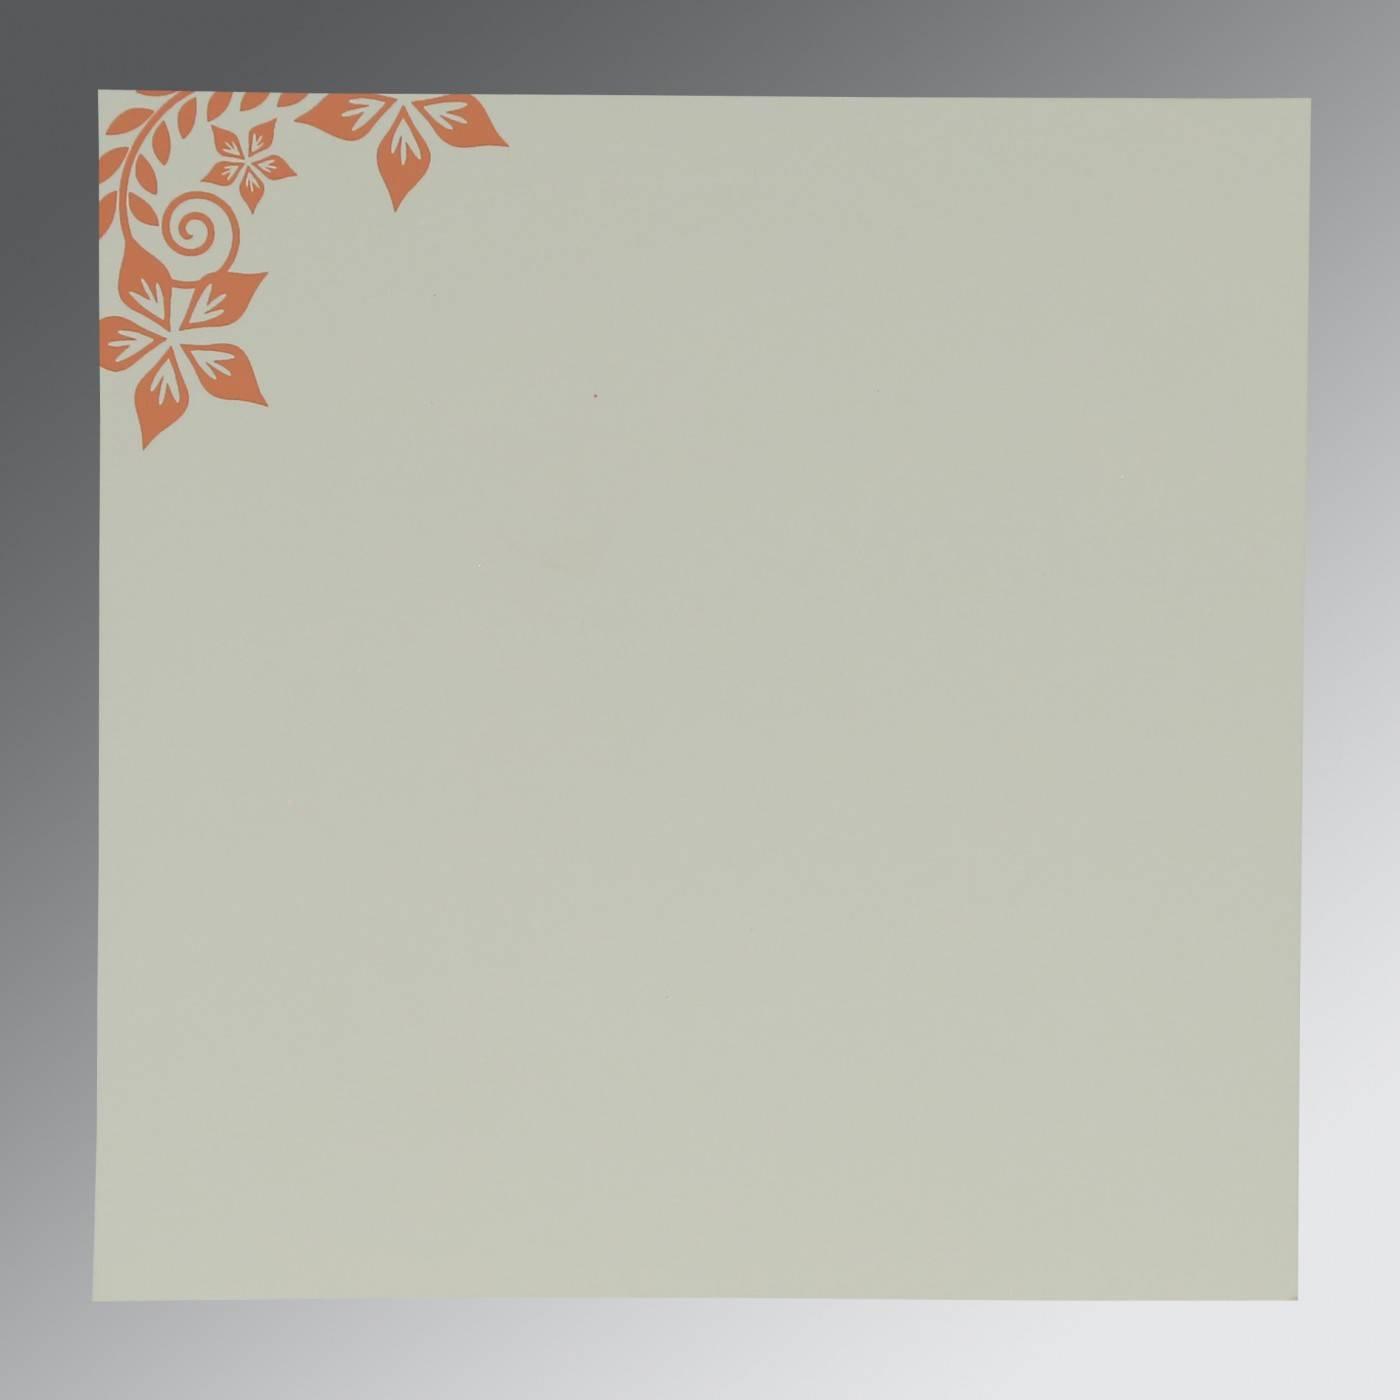 LIGHT BROWN MATTE FLORAL THEMED - SCREEN PRINTED WEDDING INVITATION : CG-8240H - IndianWeddingCards